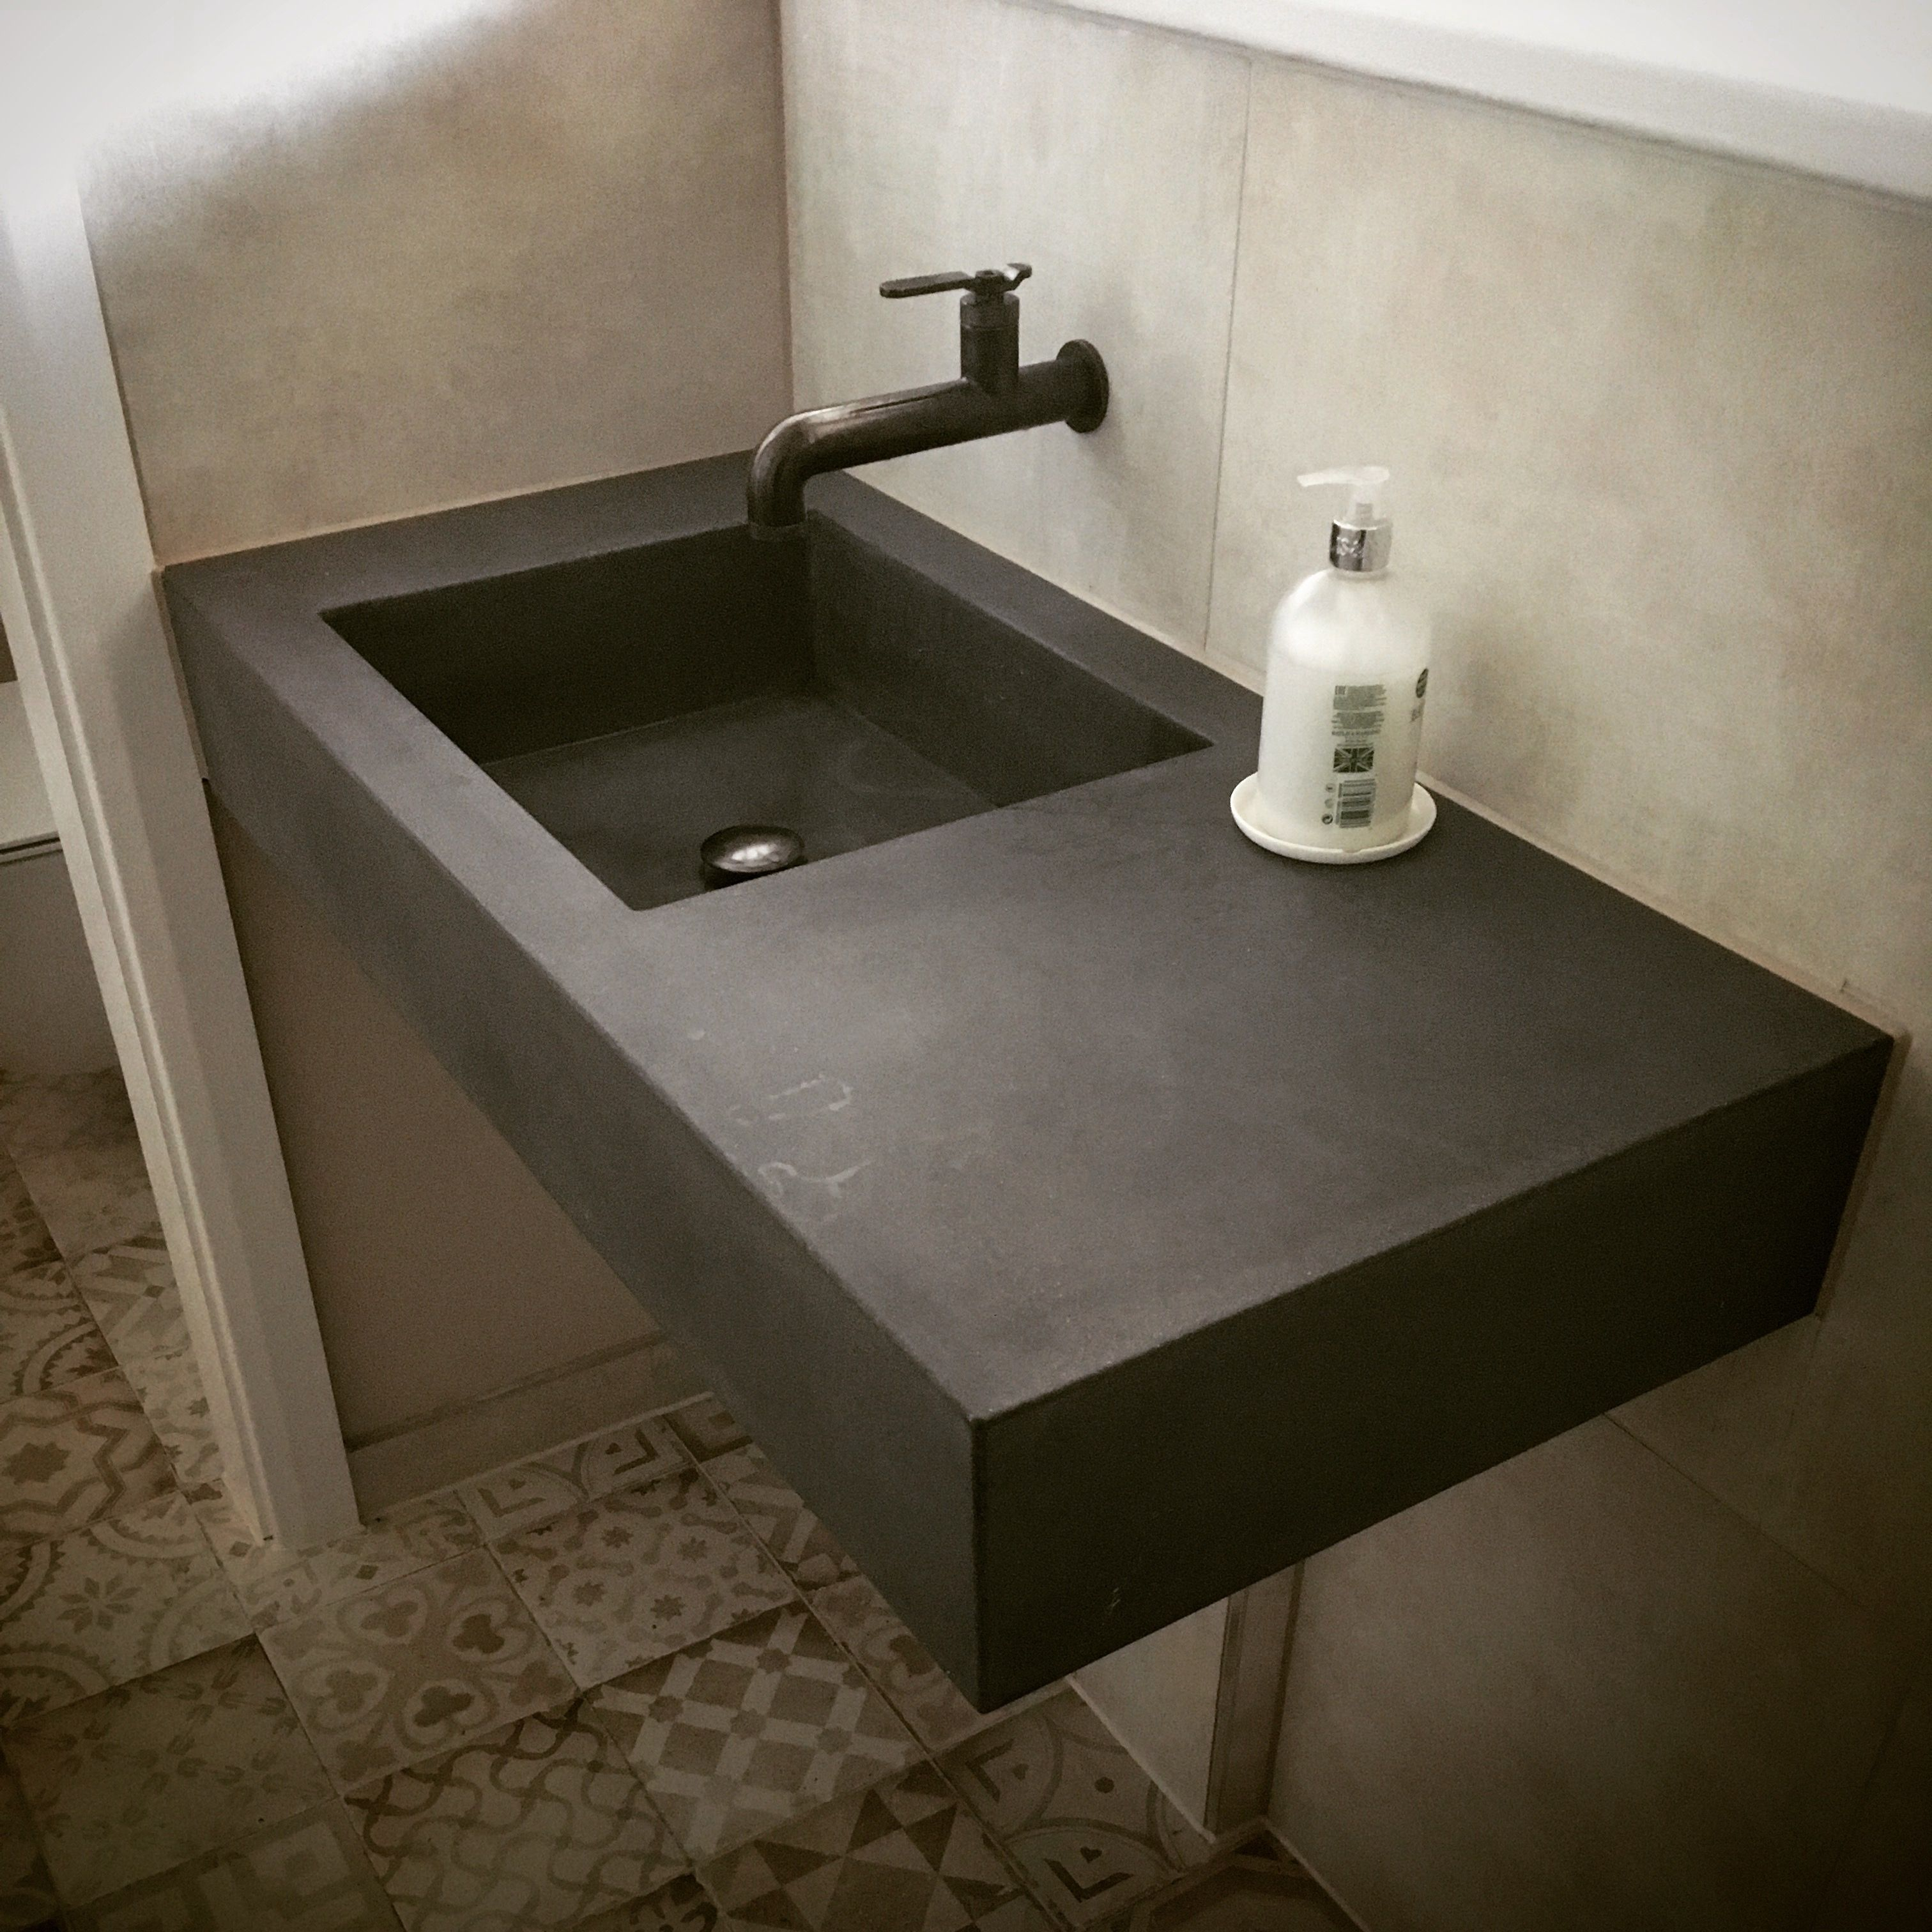 Polished Concrete Floating Vanity Sink Worktop Concrete Sink Floating Bathroom Sink Sink [ 3024 x 3024 Pixel ]